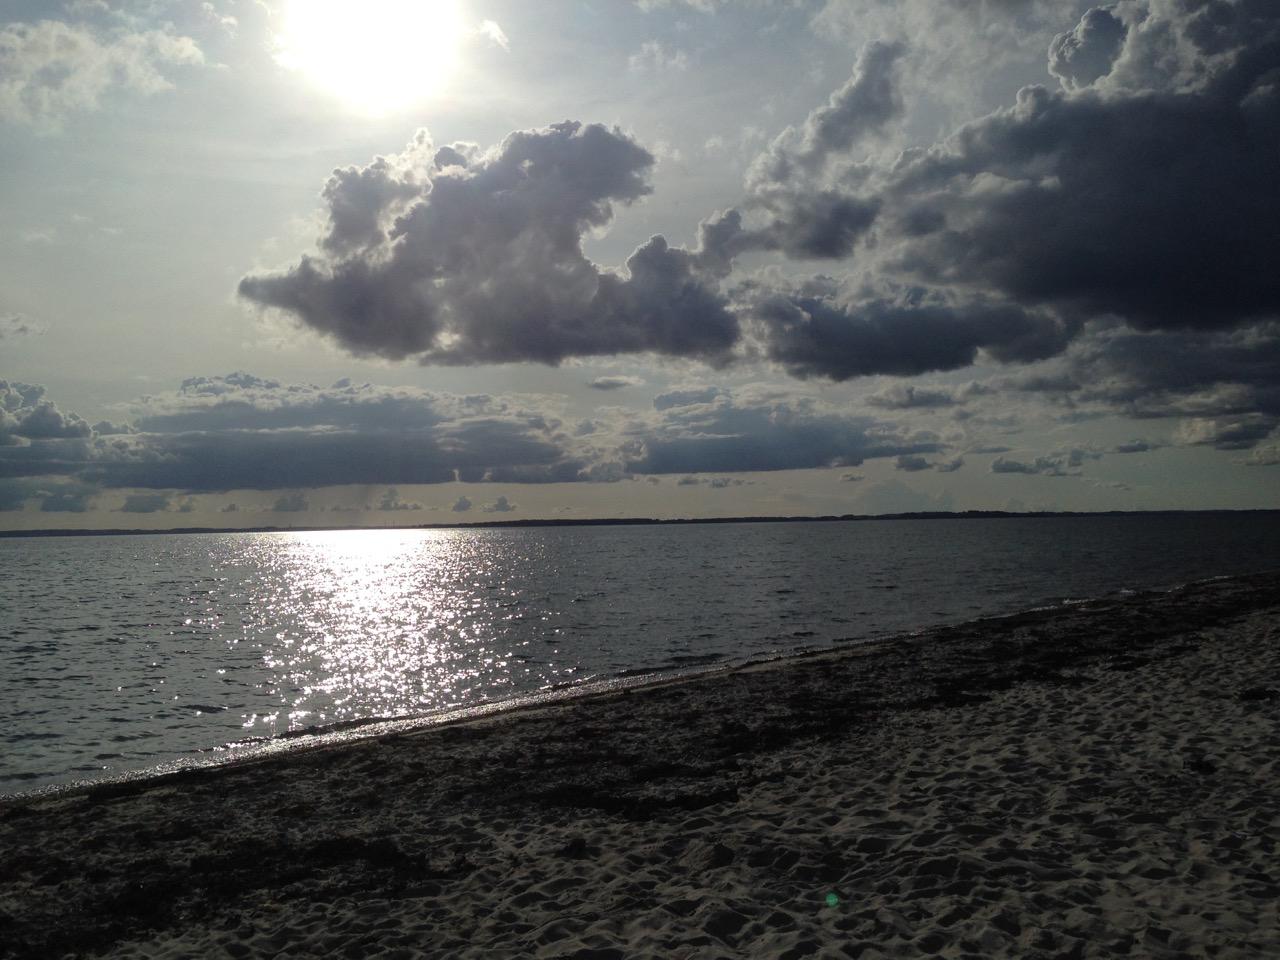 Dänemark: Die Ostsee um Kegnaes / Visual Vest